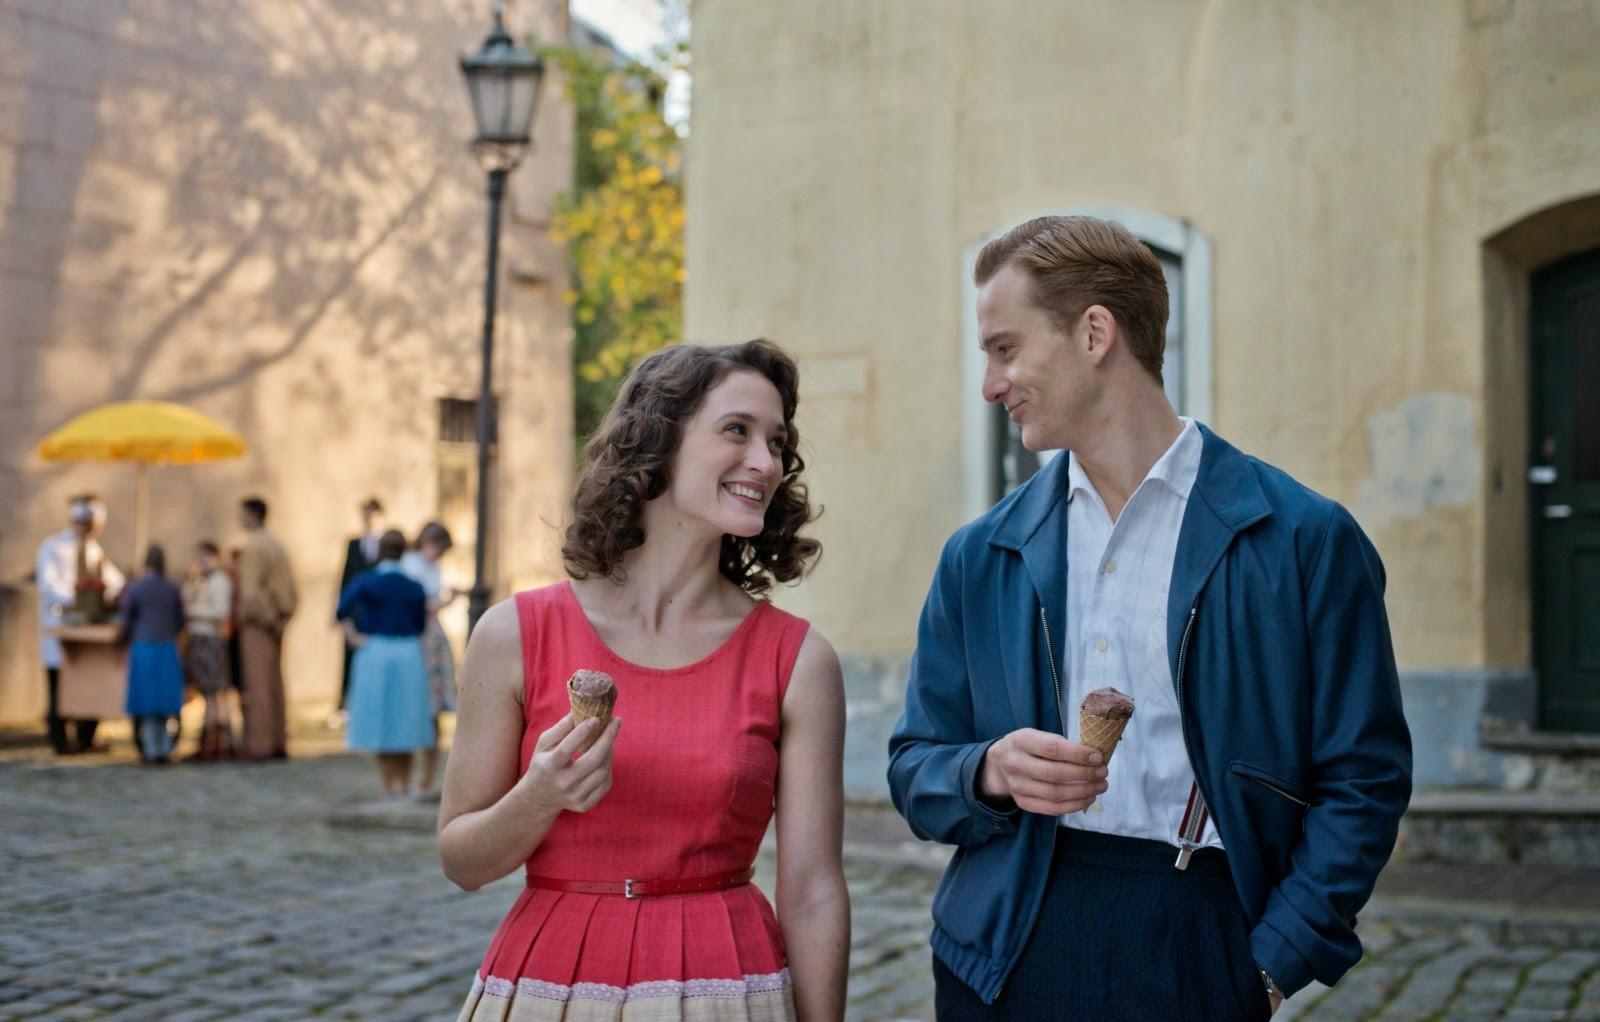 Friederike Becht (Marlene Wondrak) et Alexander Fehling (Johann Radmann) dans Le Labyrinthe du silence